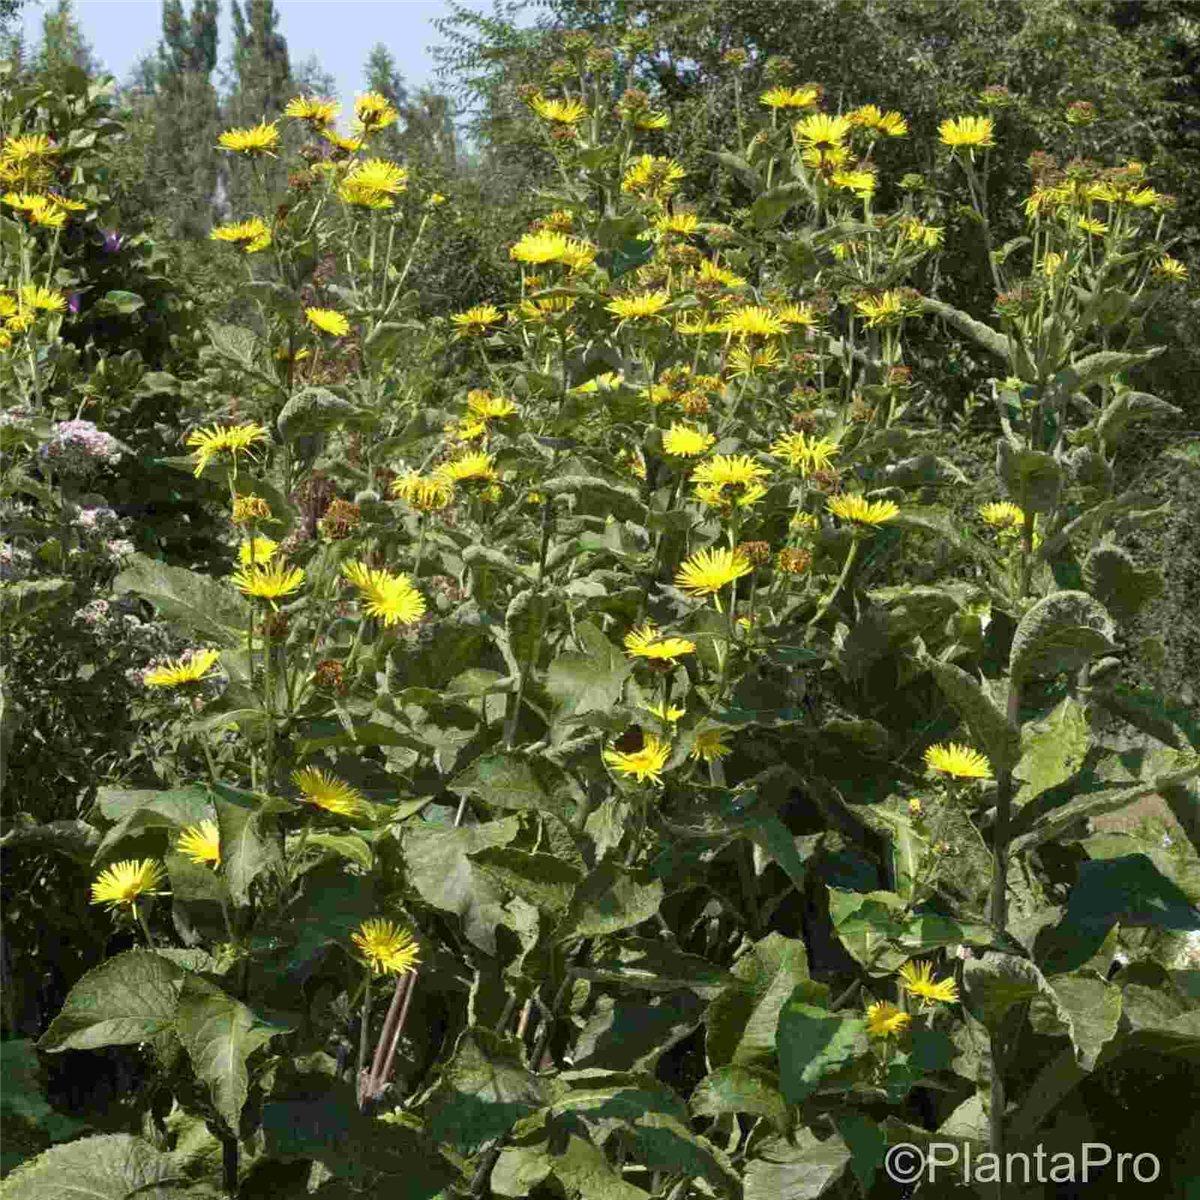 Heilpflanze Inula helenium Wildstaude Echter Alant Tb9 winterfest